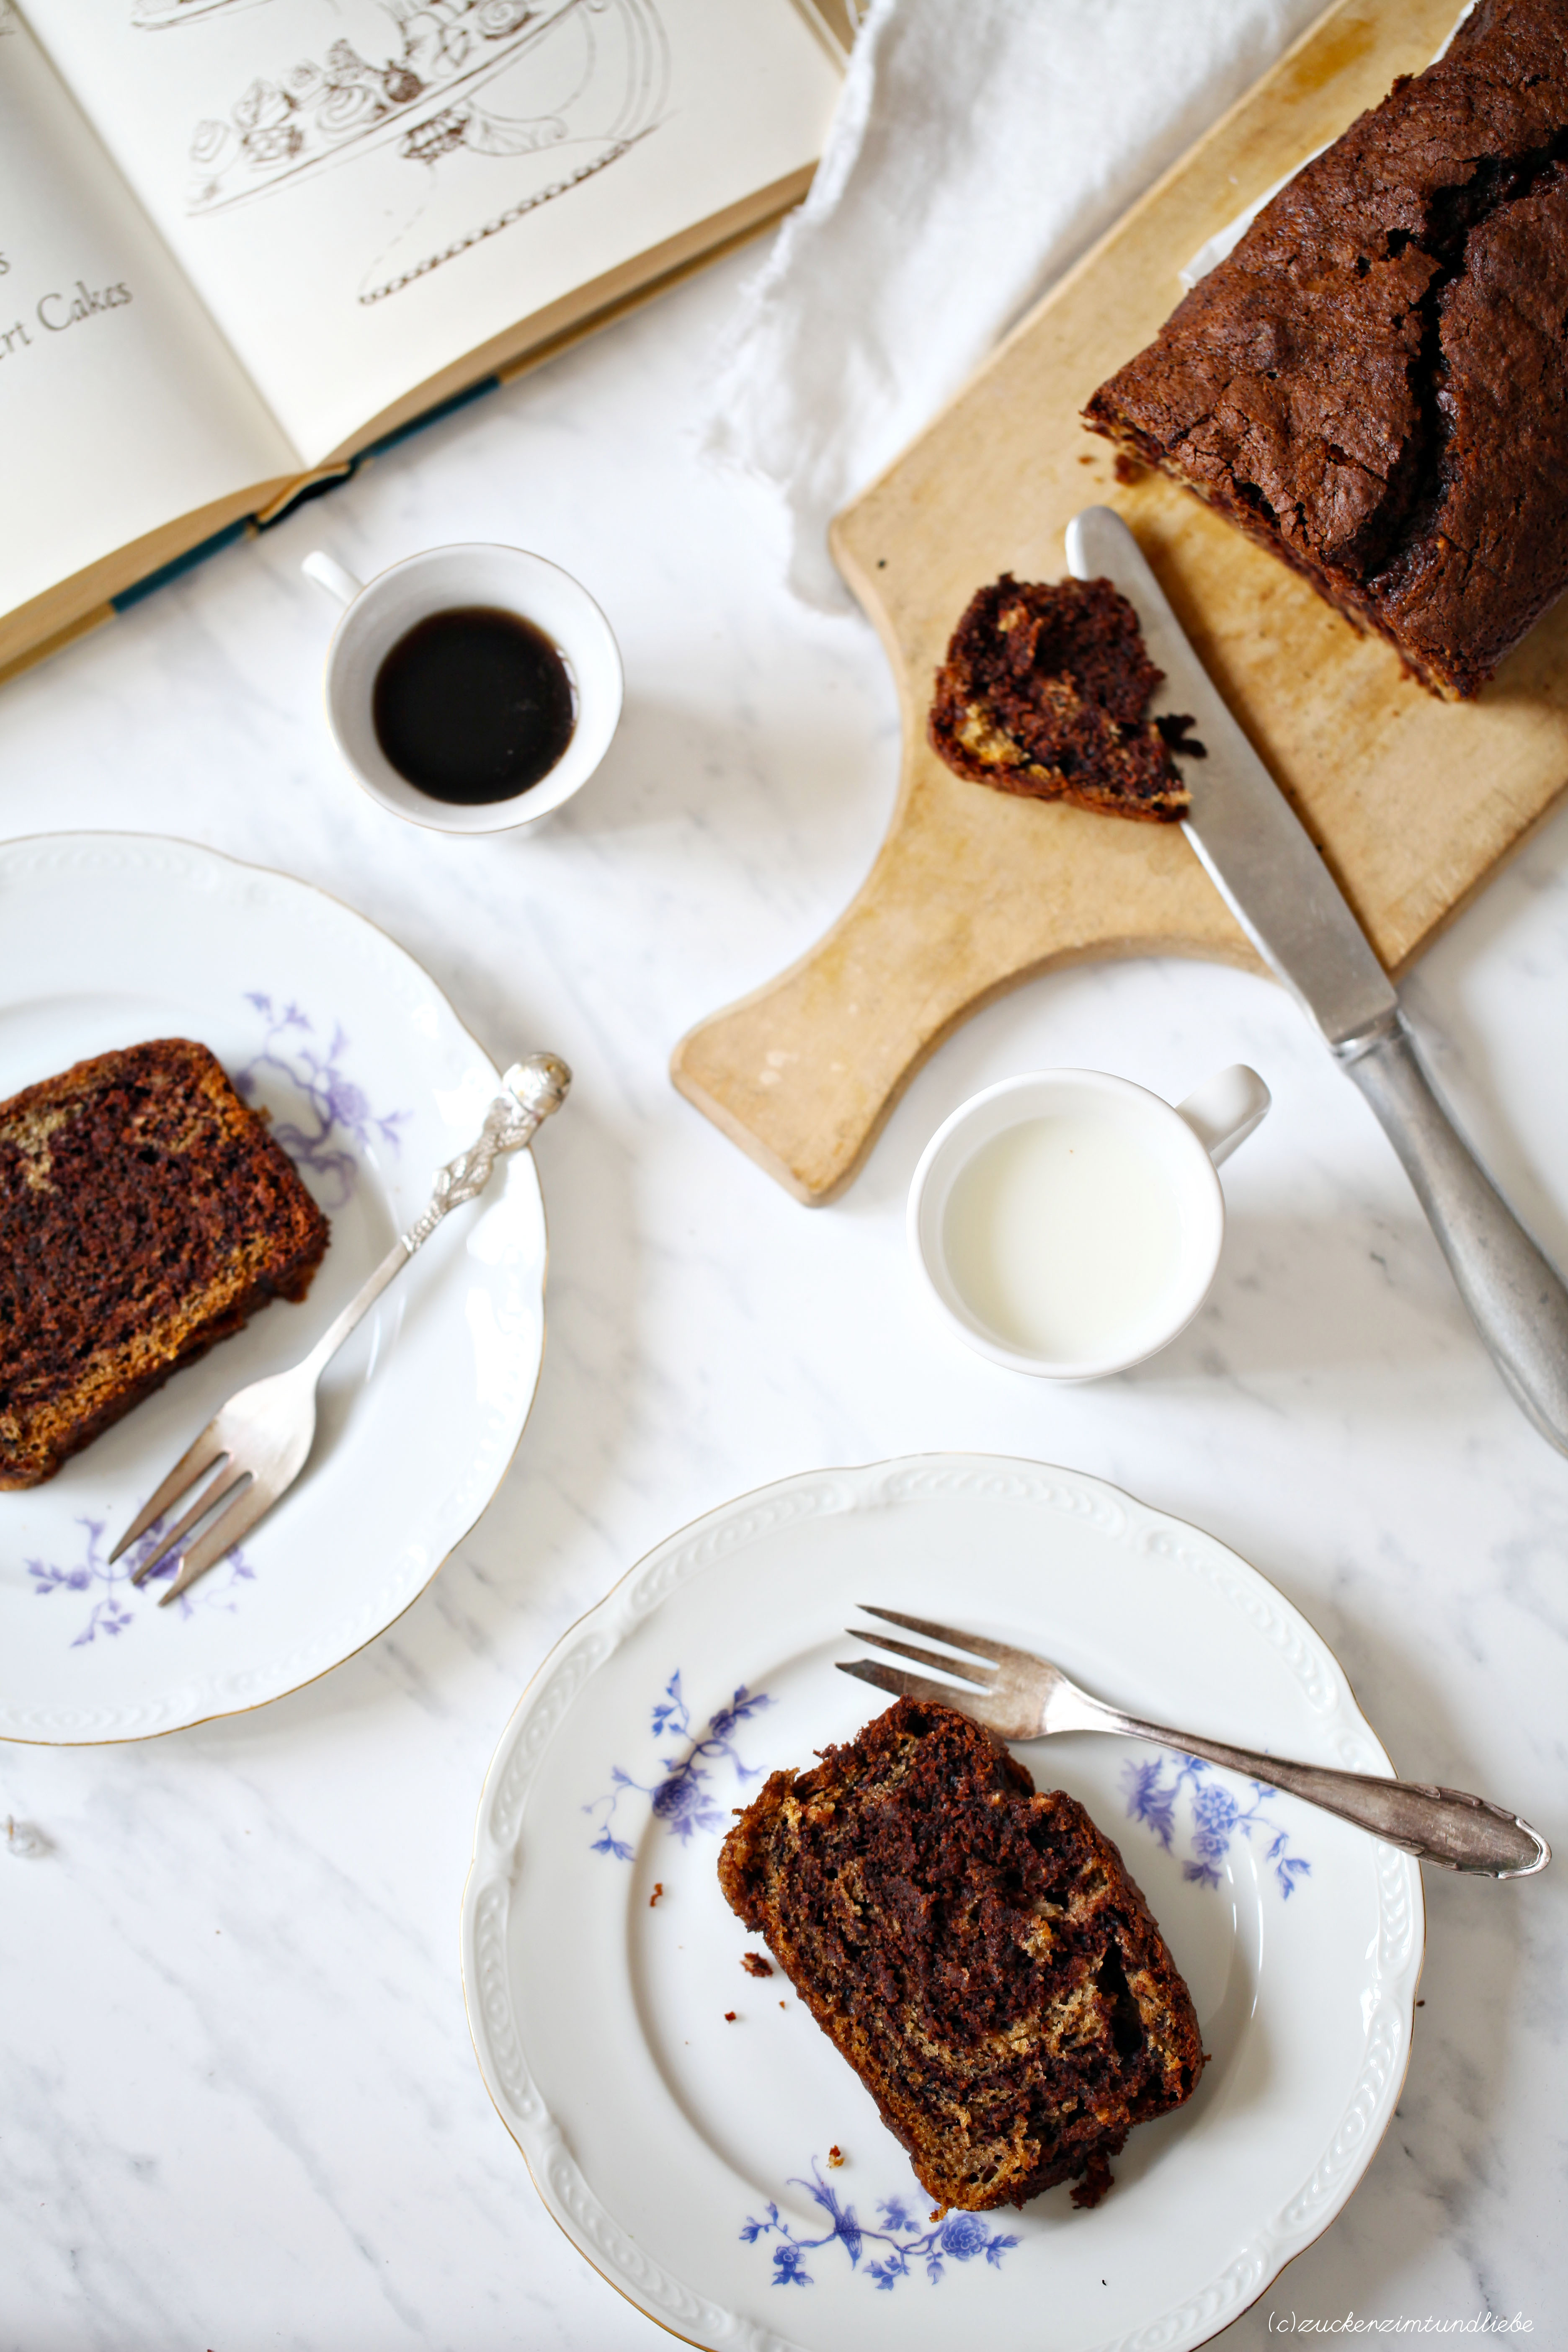 bananen schokoladenkuchen der besonders fluffigen art. Black Bedroom Furniture Sets. Home Design Ideas